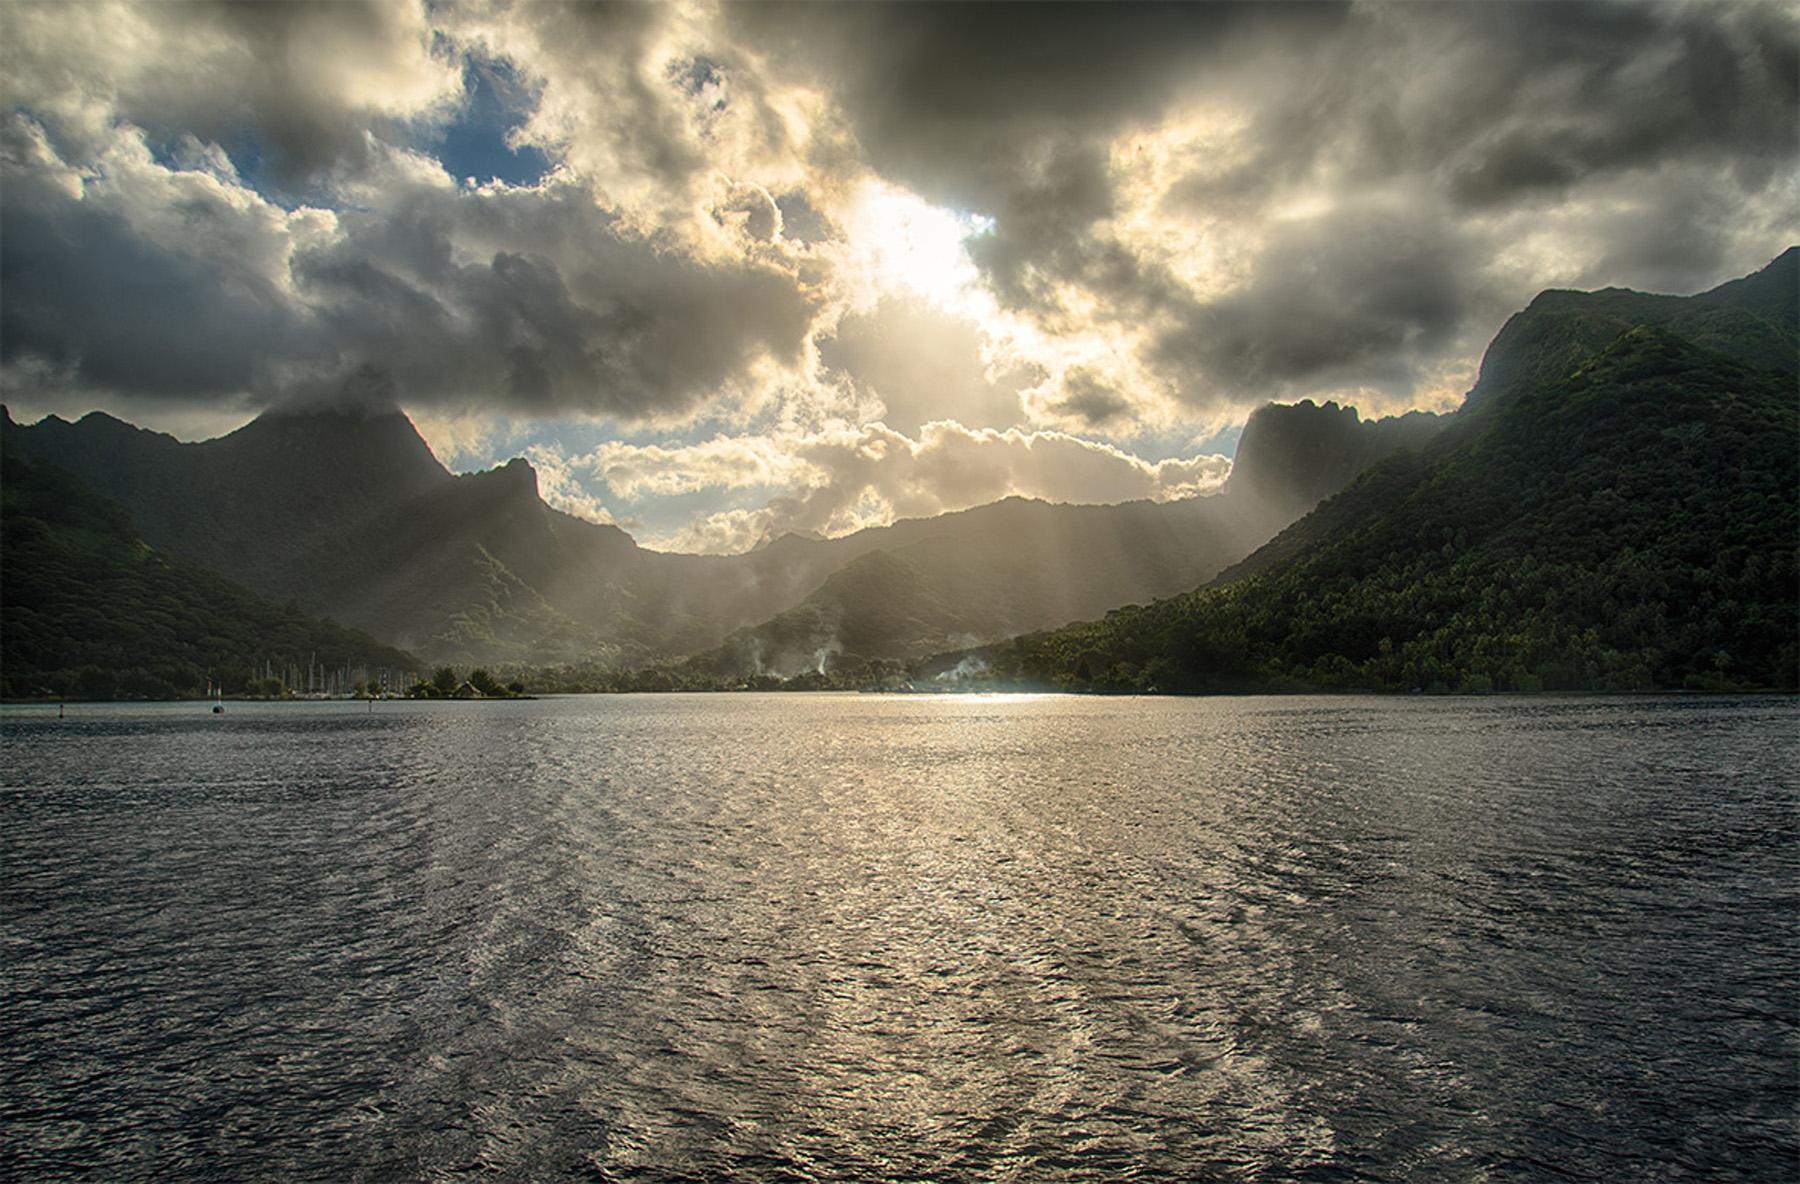 Jean-Paul de Jager: Tahiti